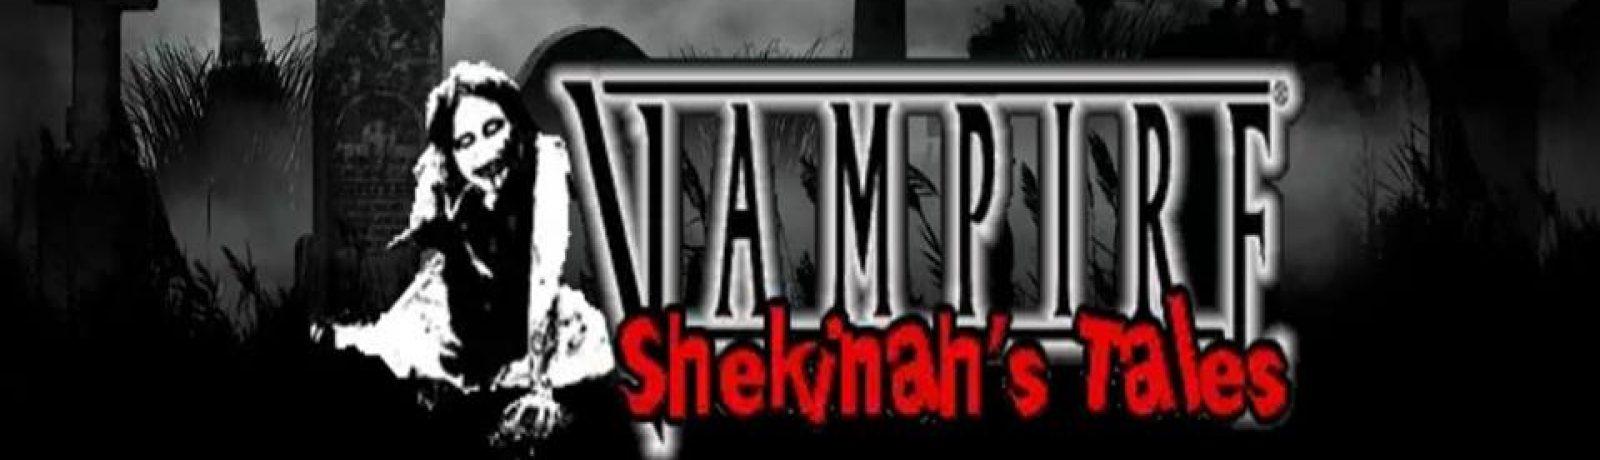 I Racconti di Shekinah